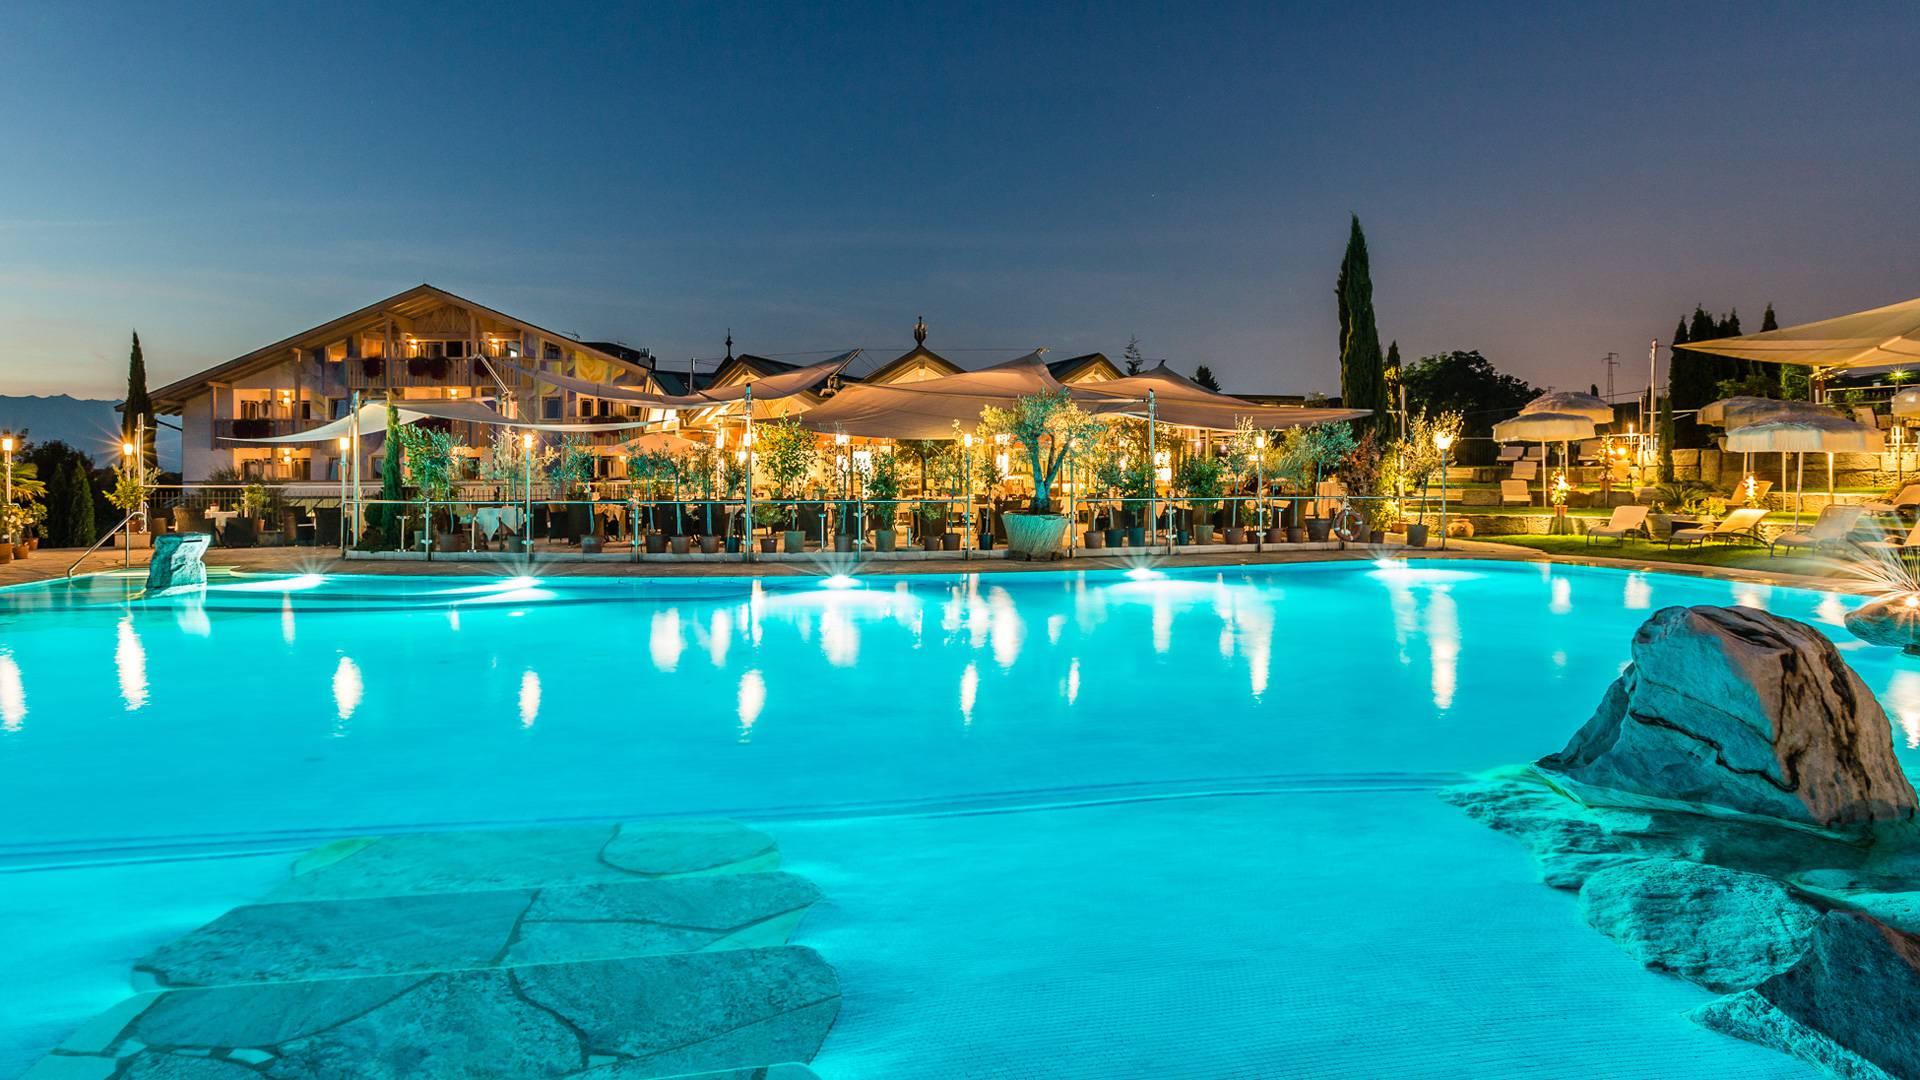 Wellneb Hotel Alto Adige  Stelle